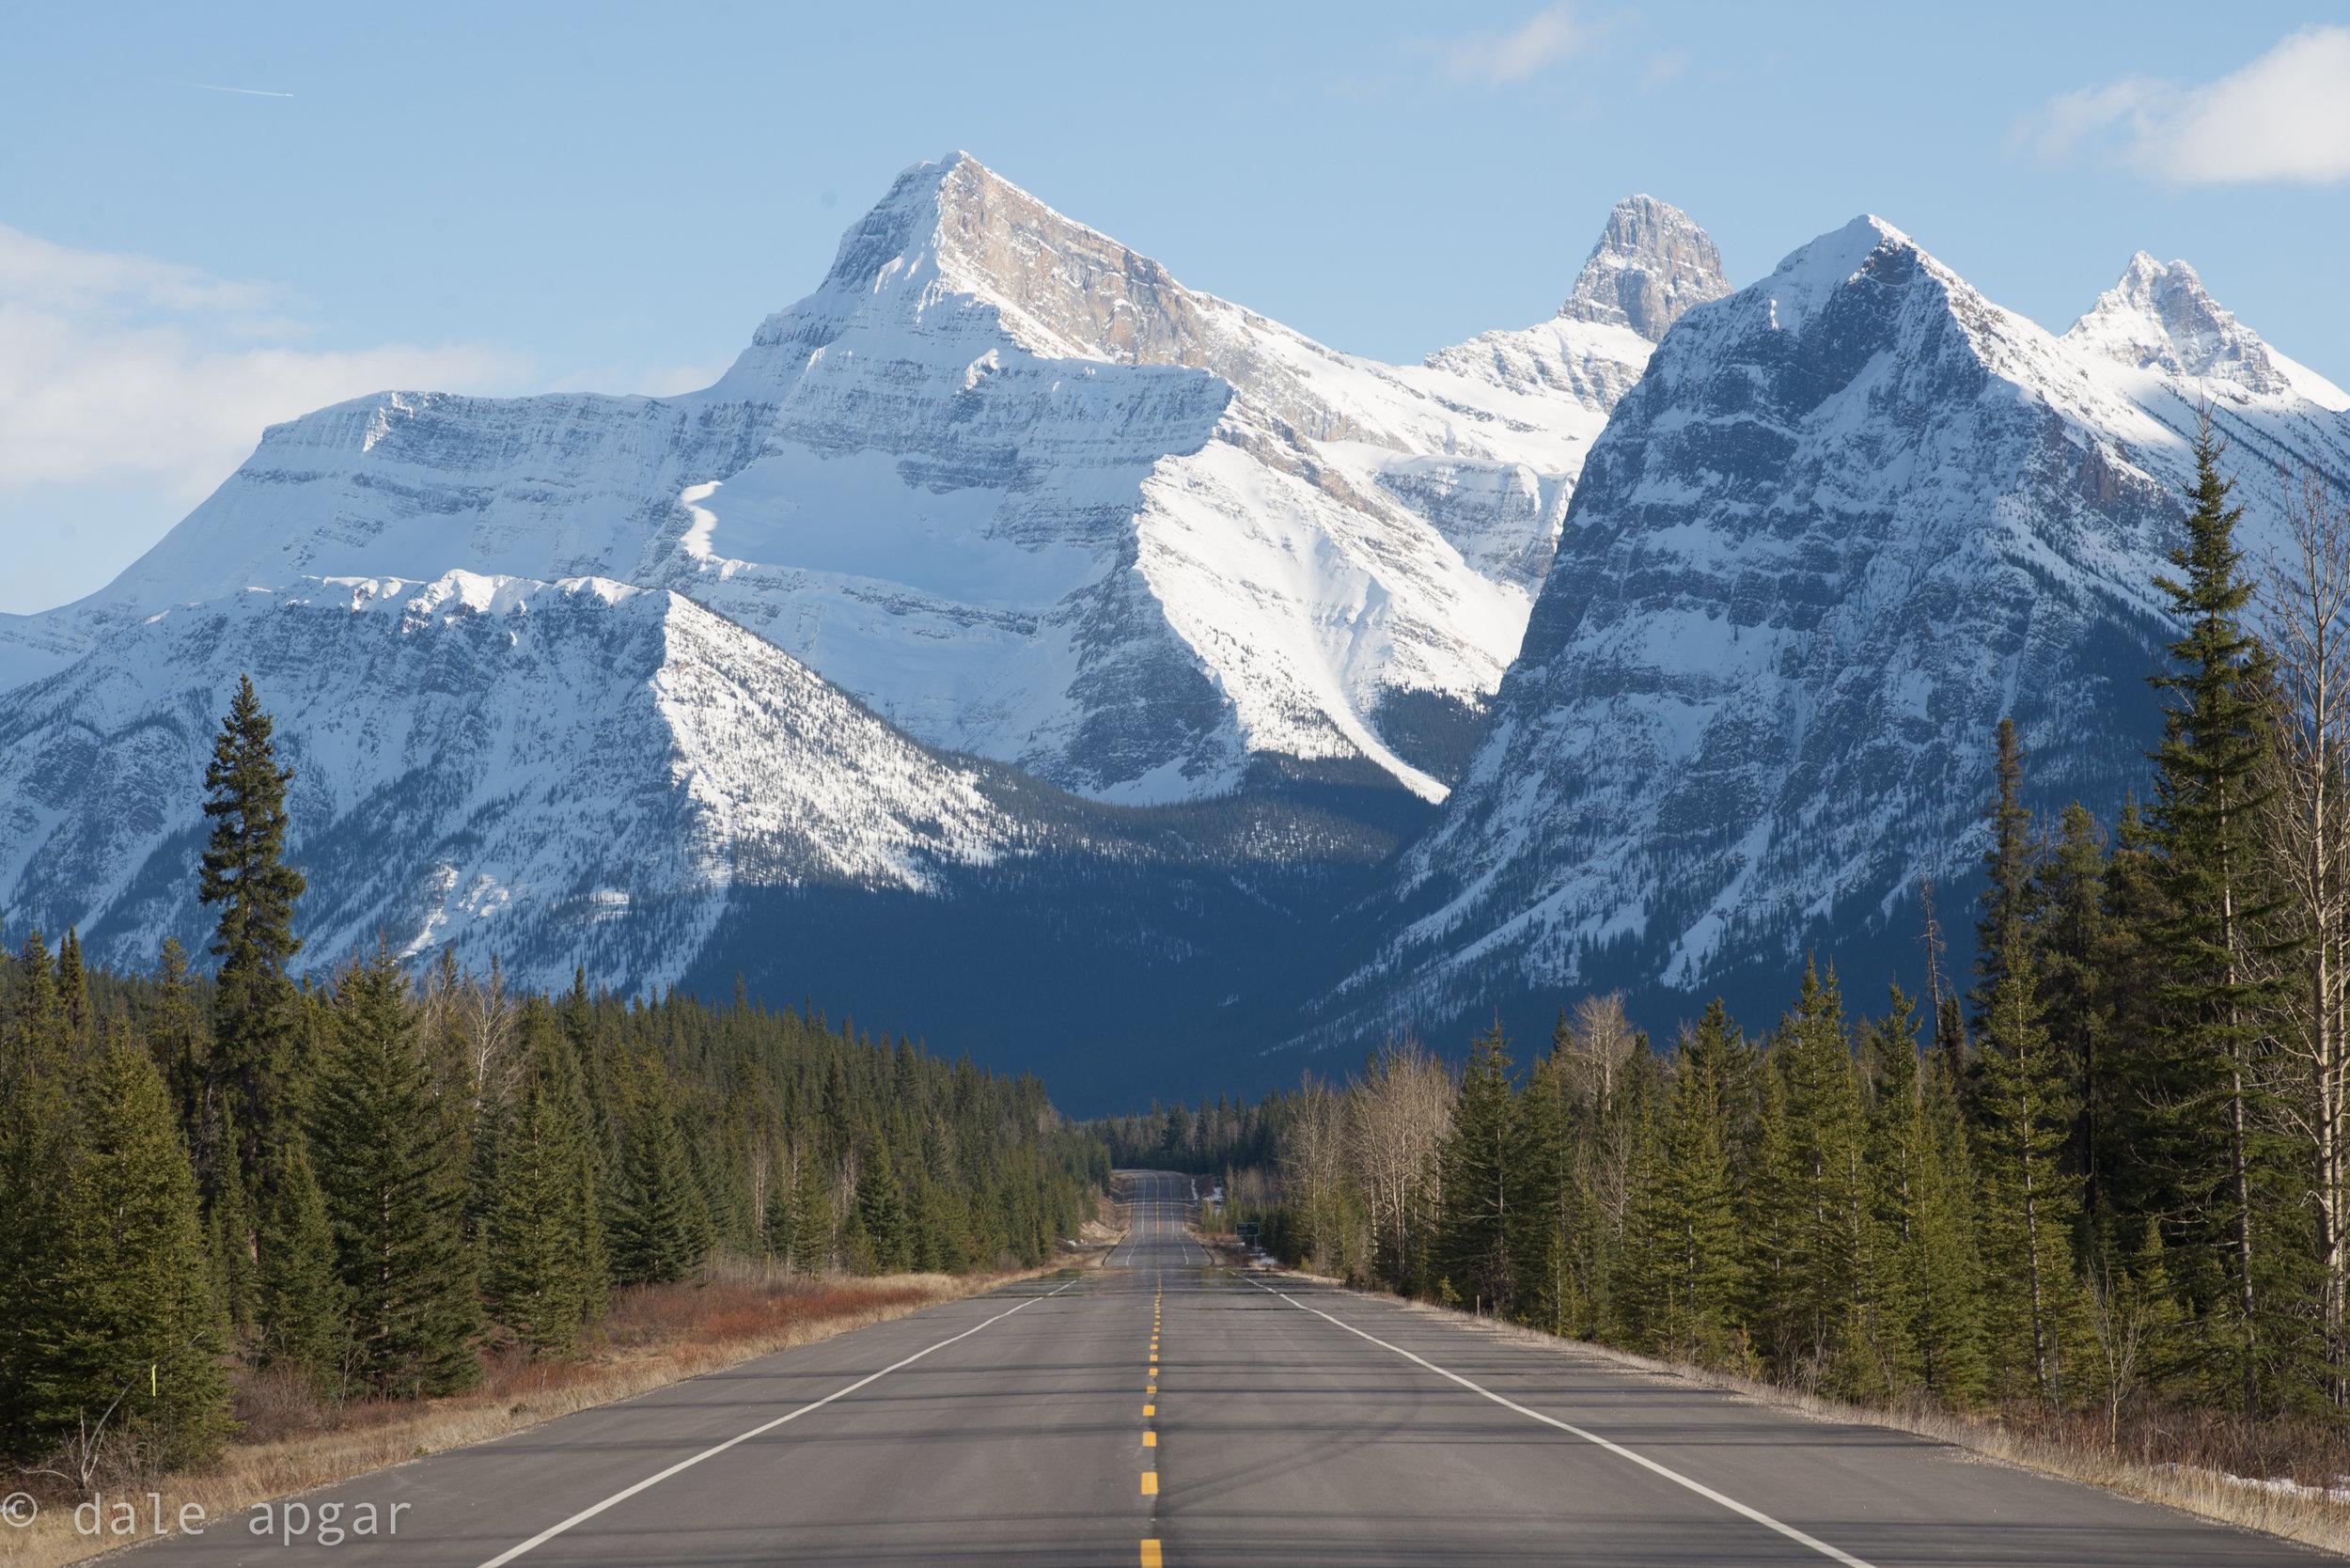 road trip views aren't so bad